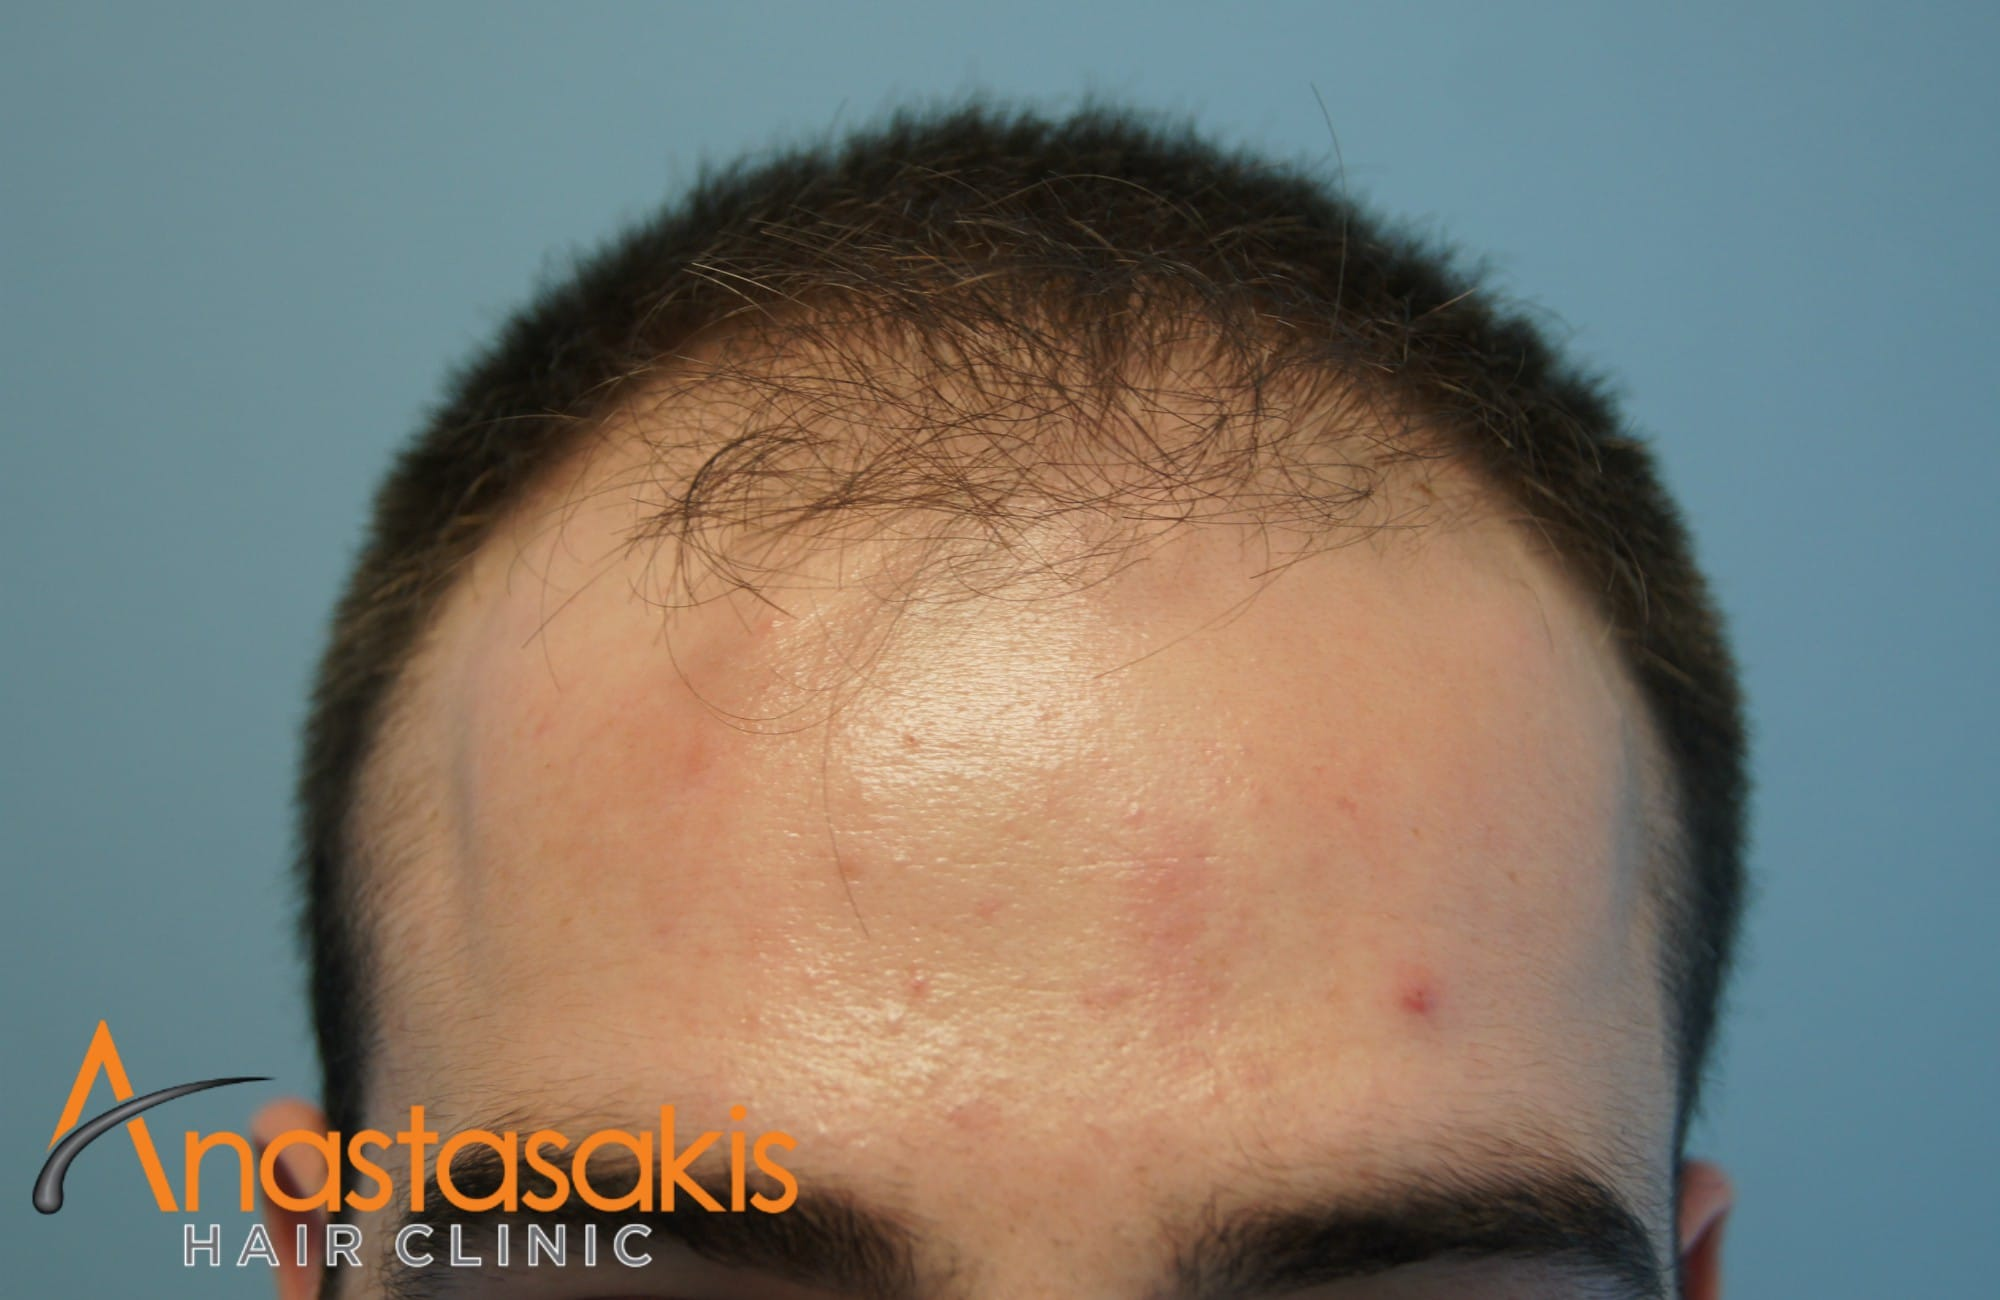 hairline ασθενούς πριν τη μεταμοσχευση μαλλιων με 1500 fus